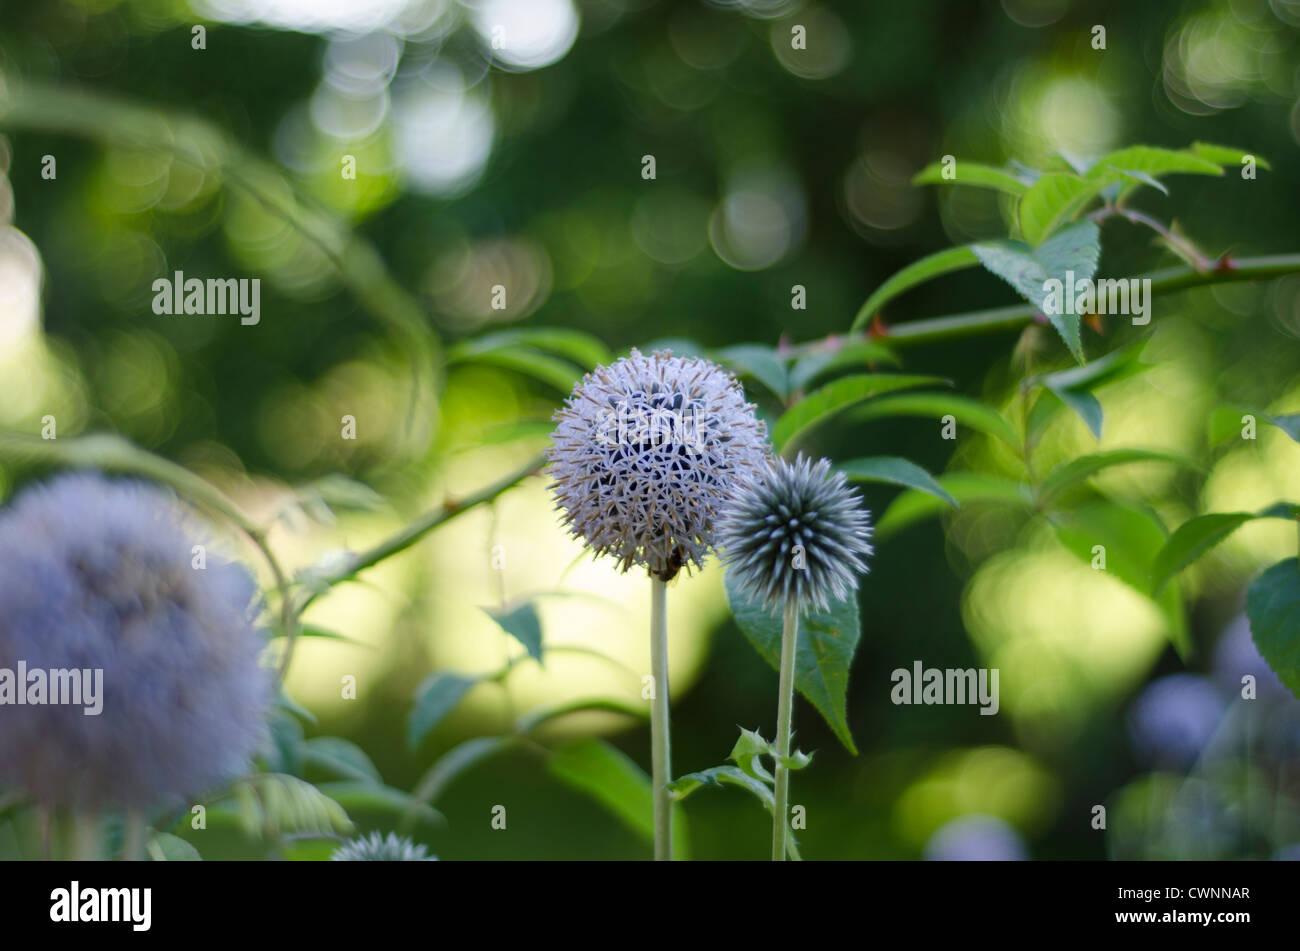 The purple, spherical, geometric flowers of the globe thistle - Echinops setifer - Stock Image